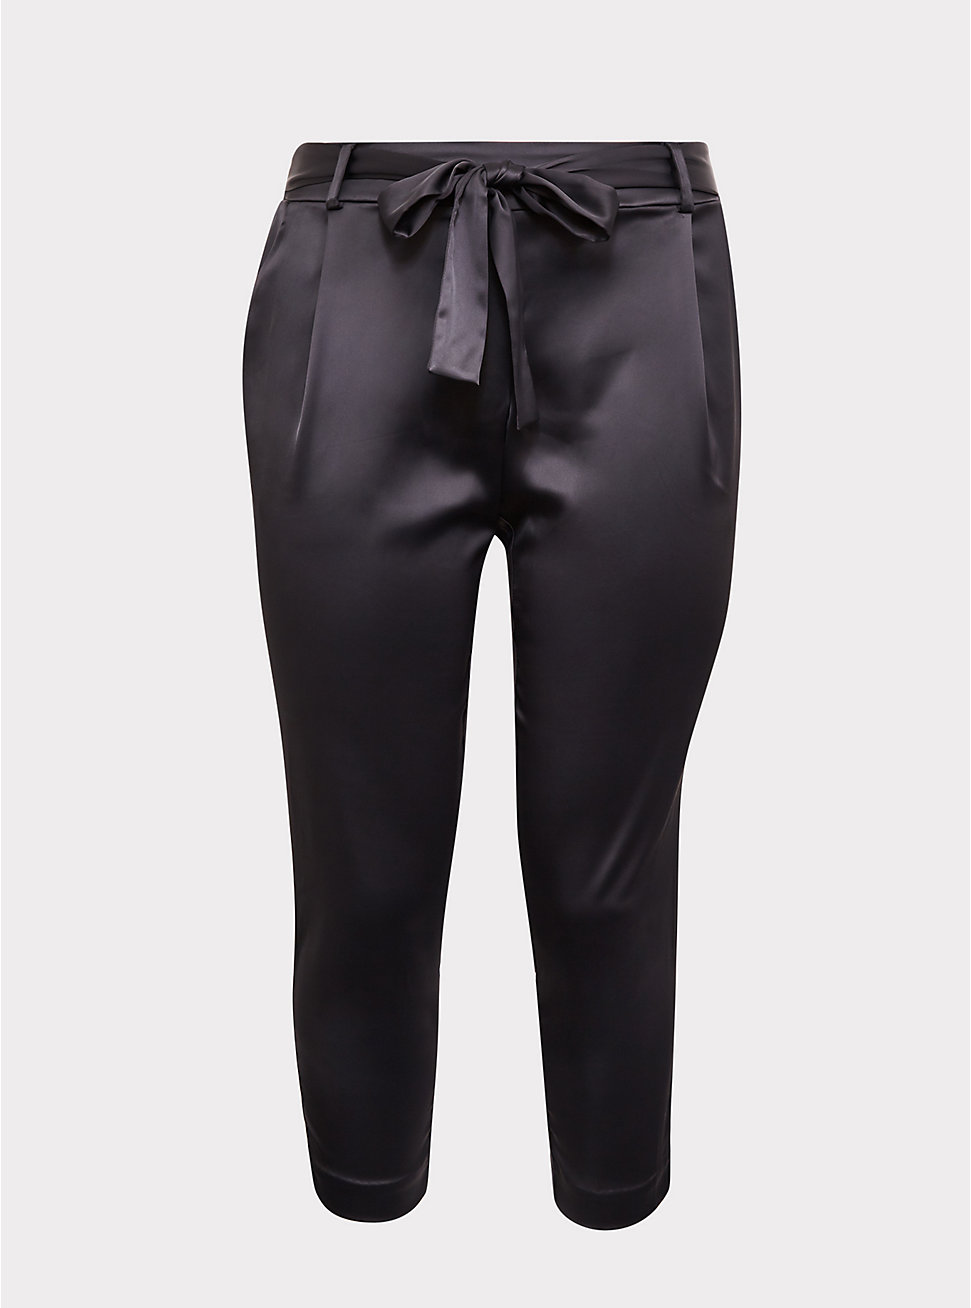 Dark Grey Satin Tie-front Cigarette Pant